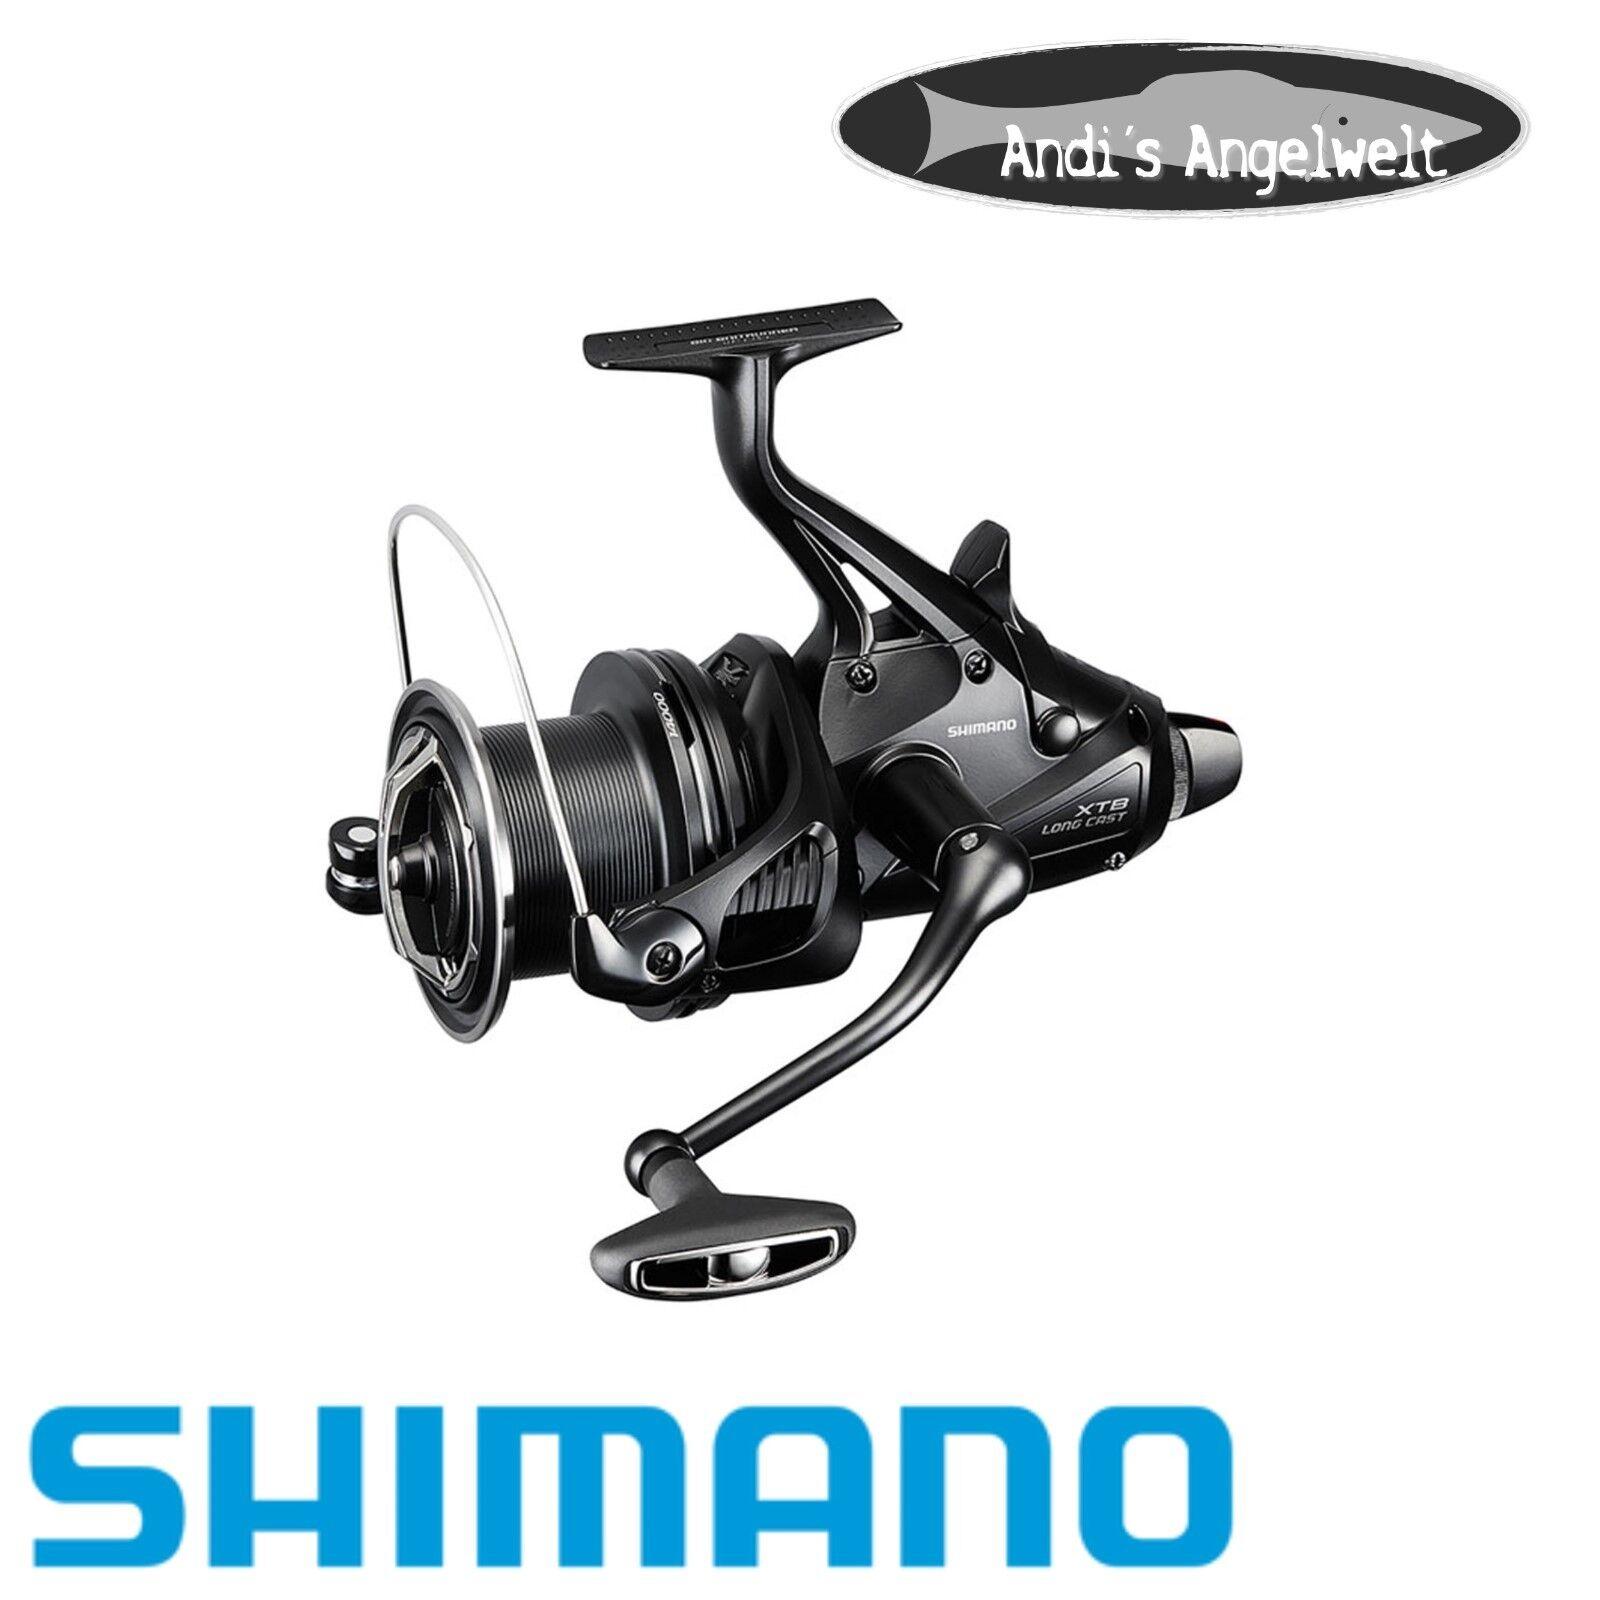 Shimano Big Baitrunner XTB 14000 Longcastaperto ruoloCarpa ruolo